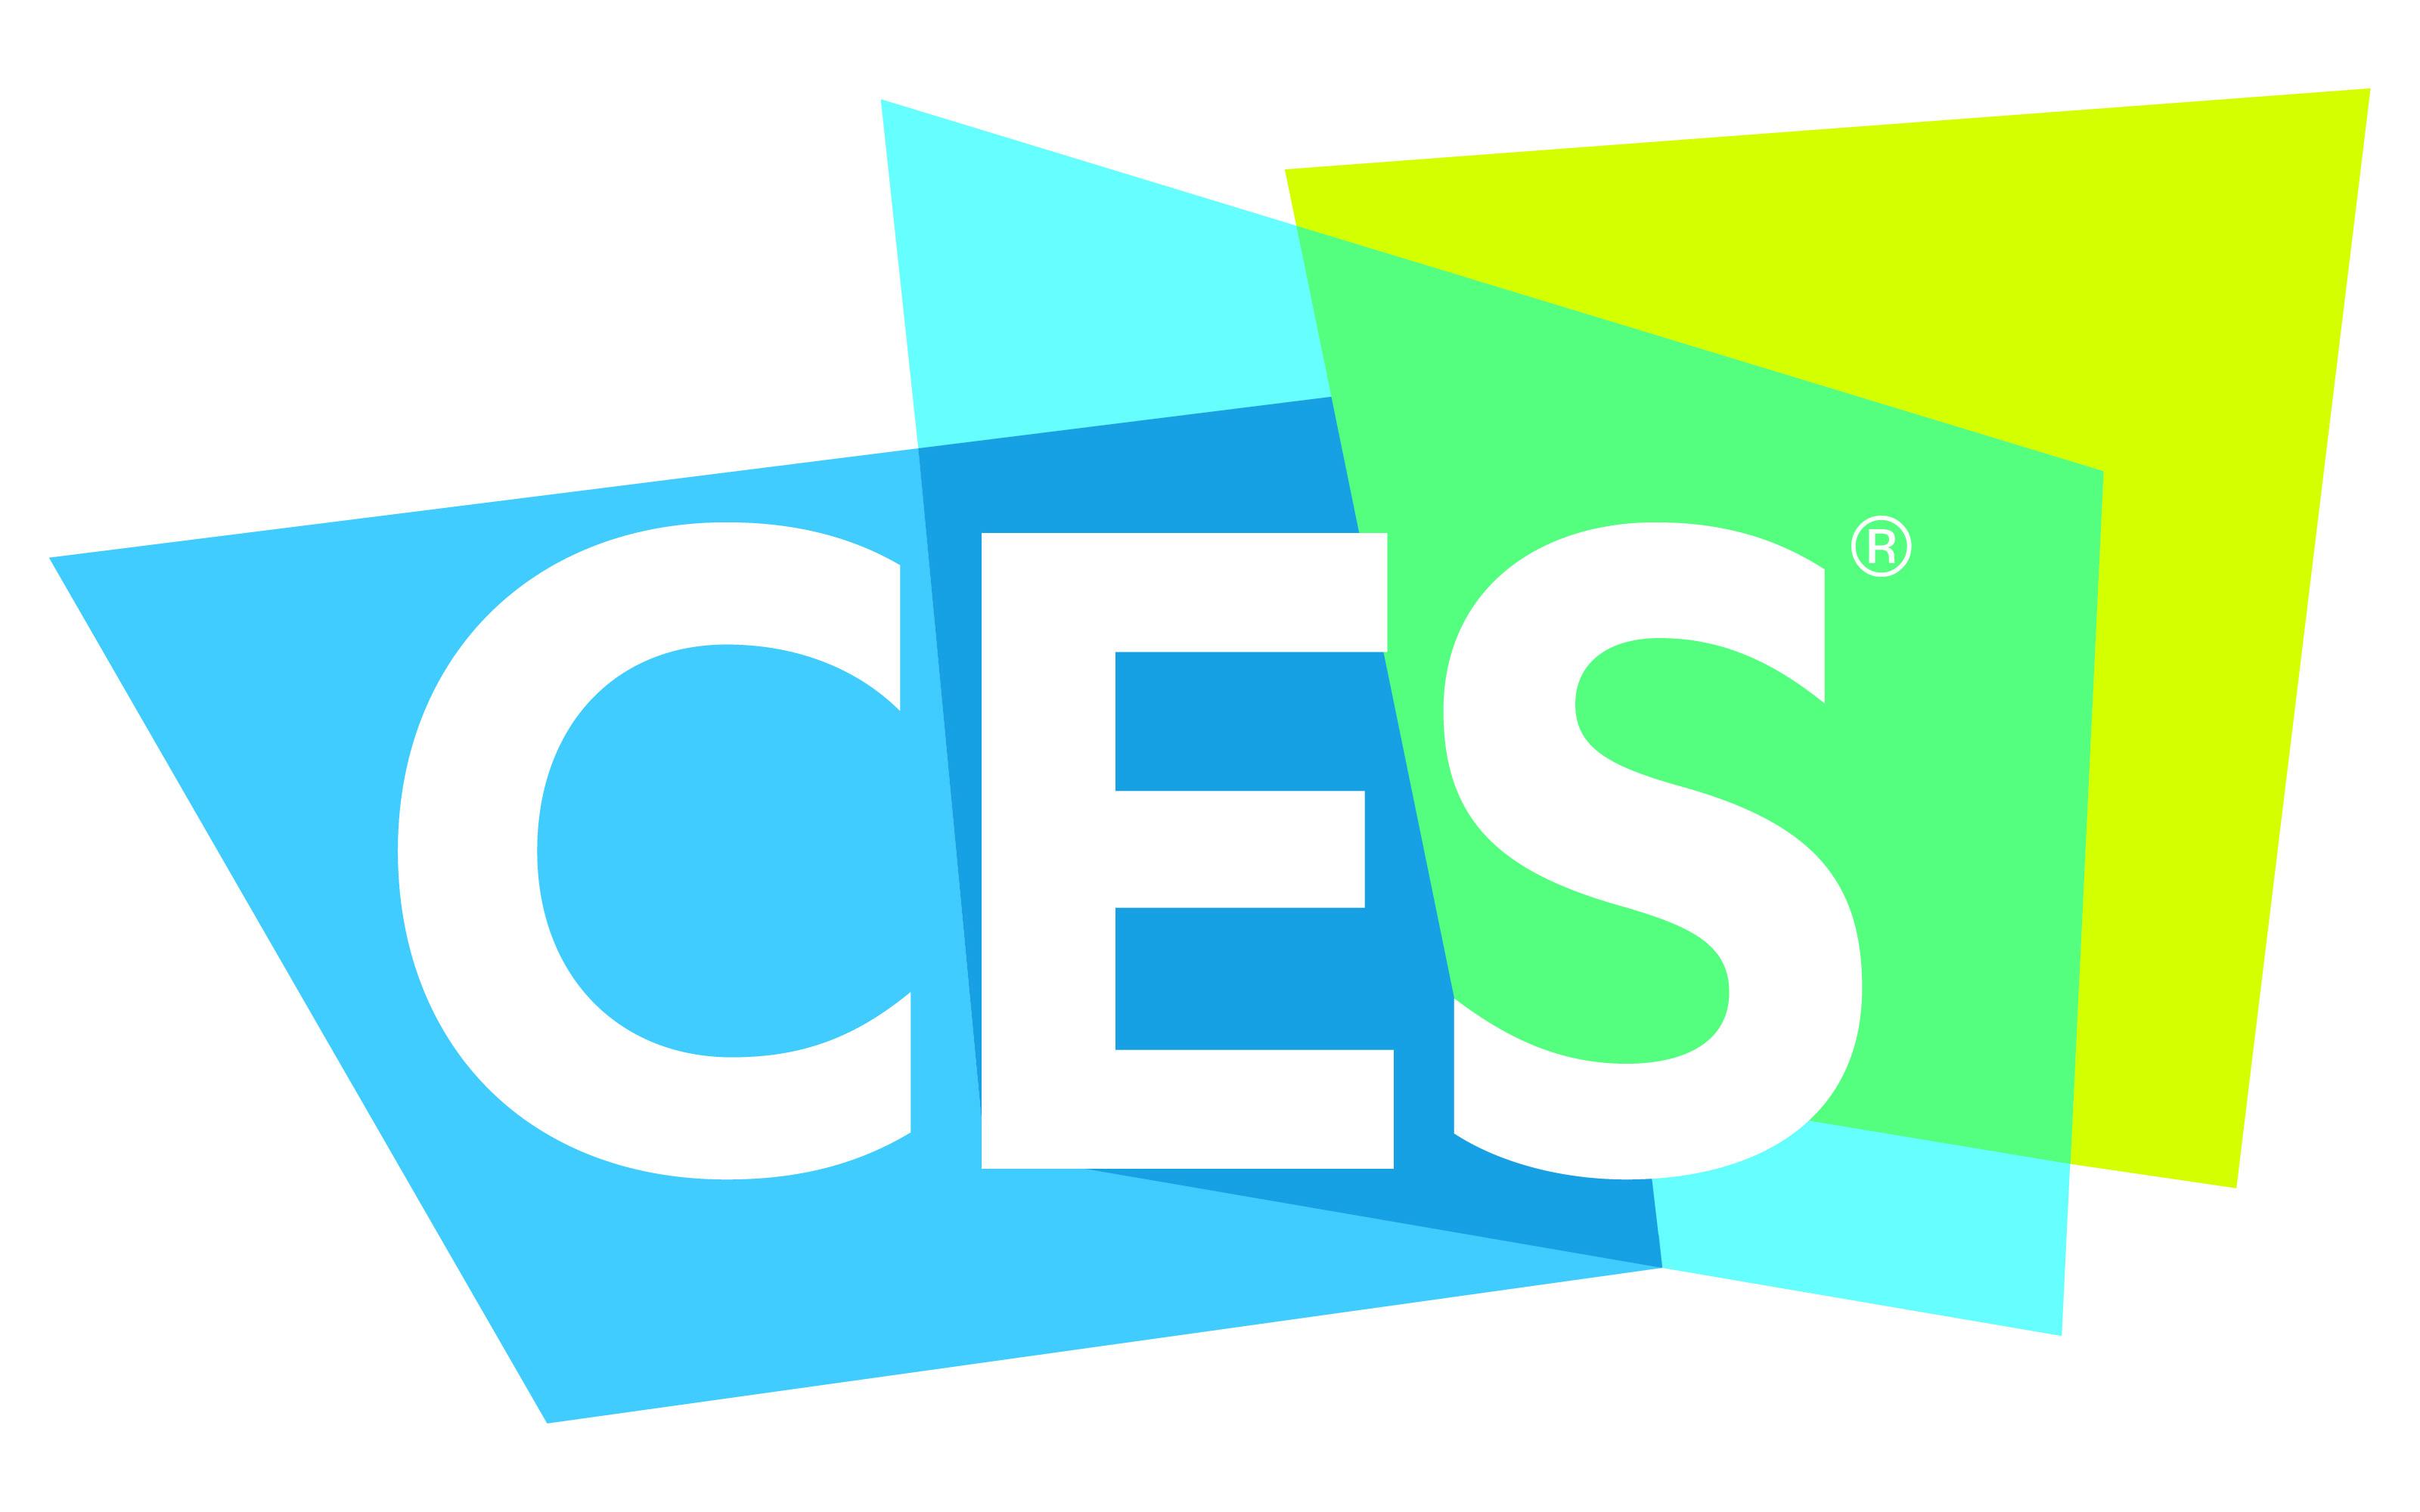 CES Logo Wallpaper